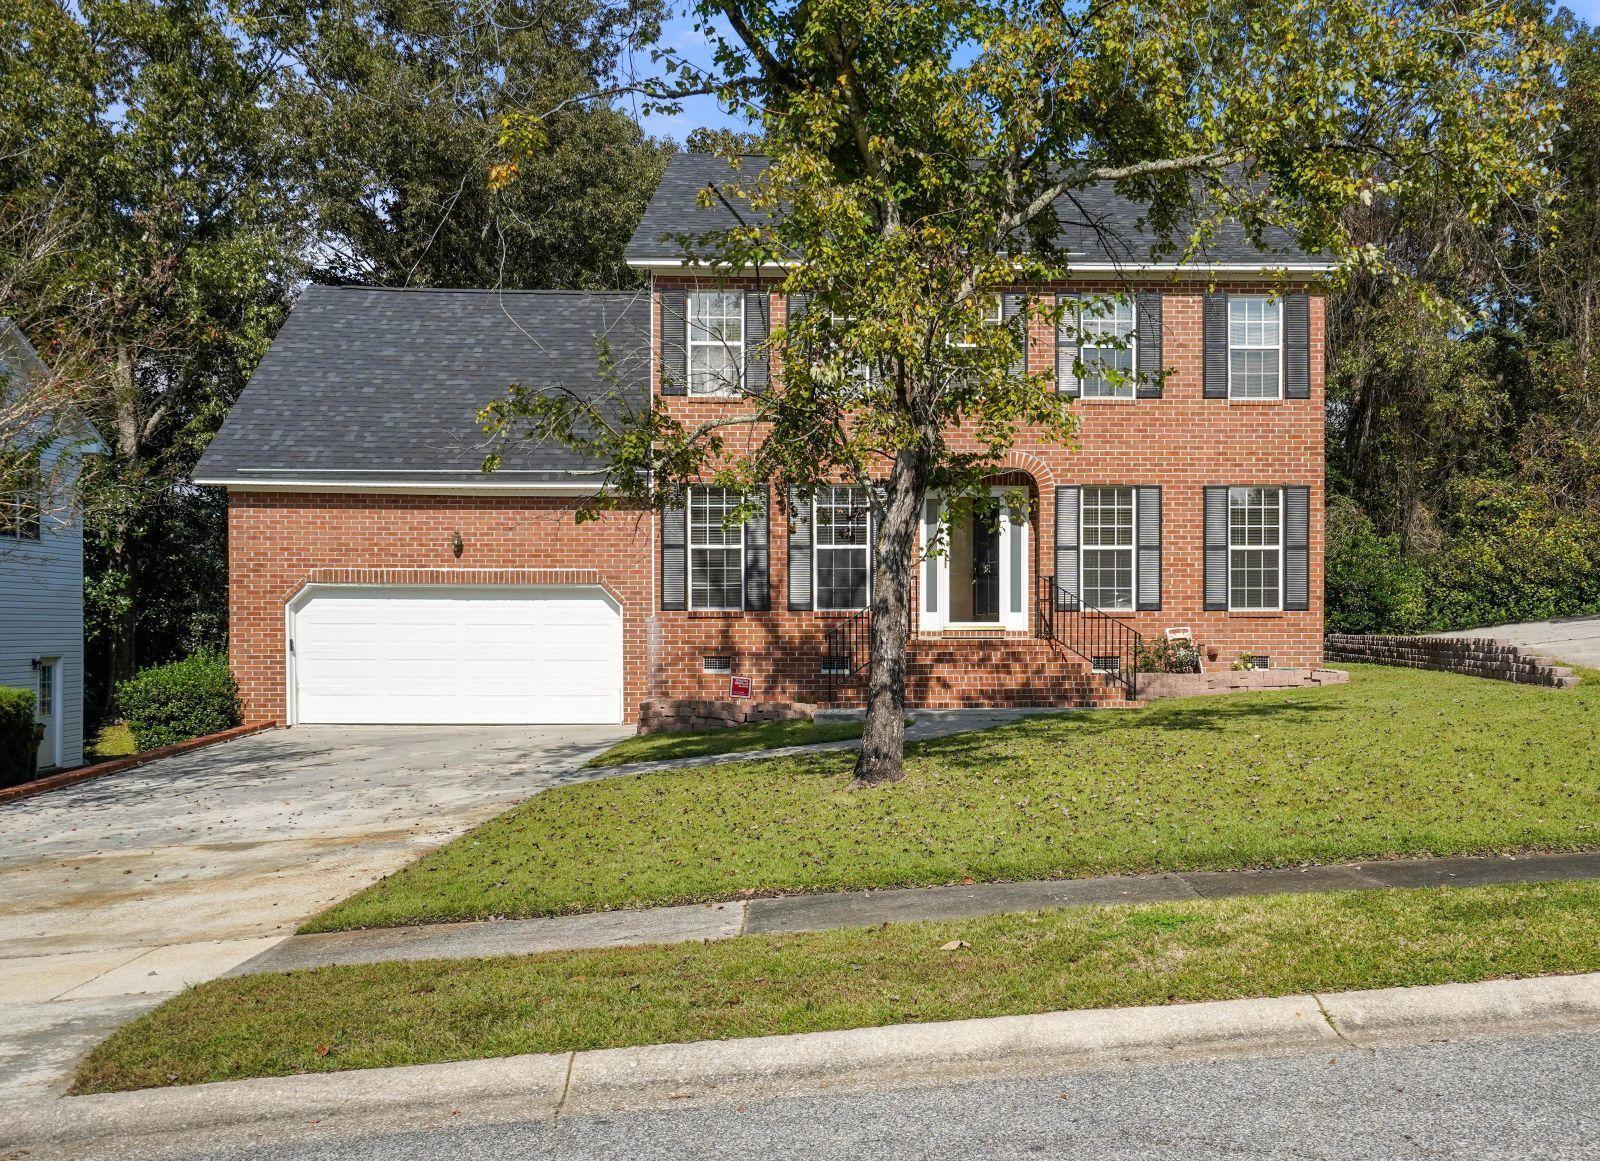 Crowfield Plantation Homes For Sale - 161 Belleplaine, Goose Creek, SC - 4